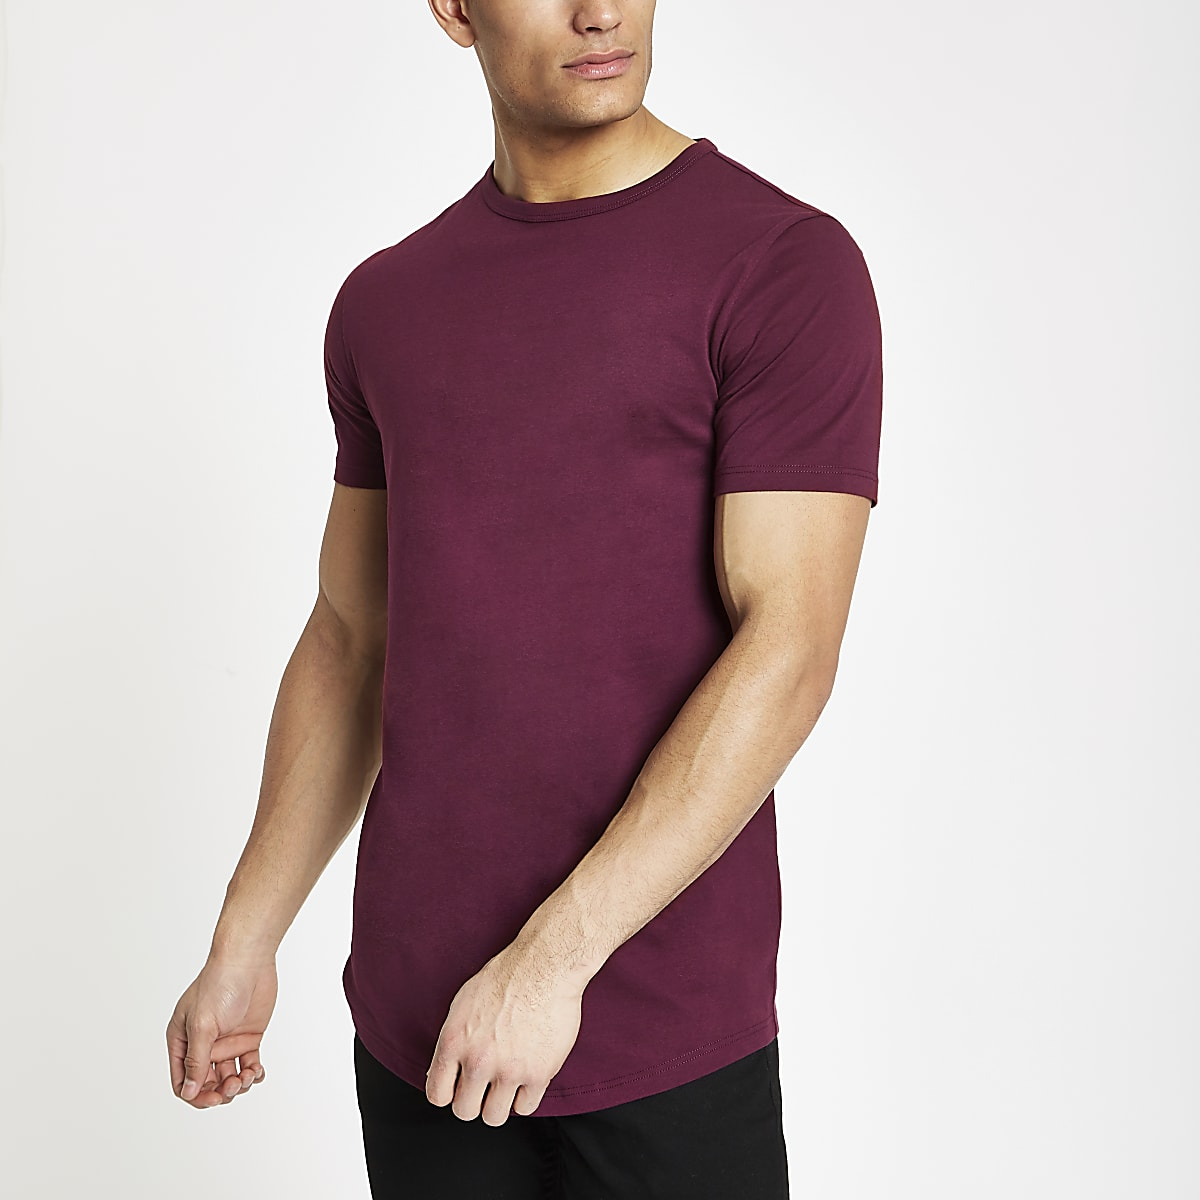 Red curved hem longline T-shirt